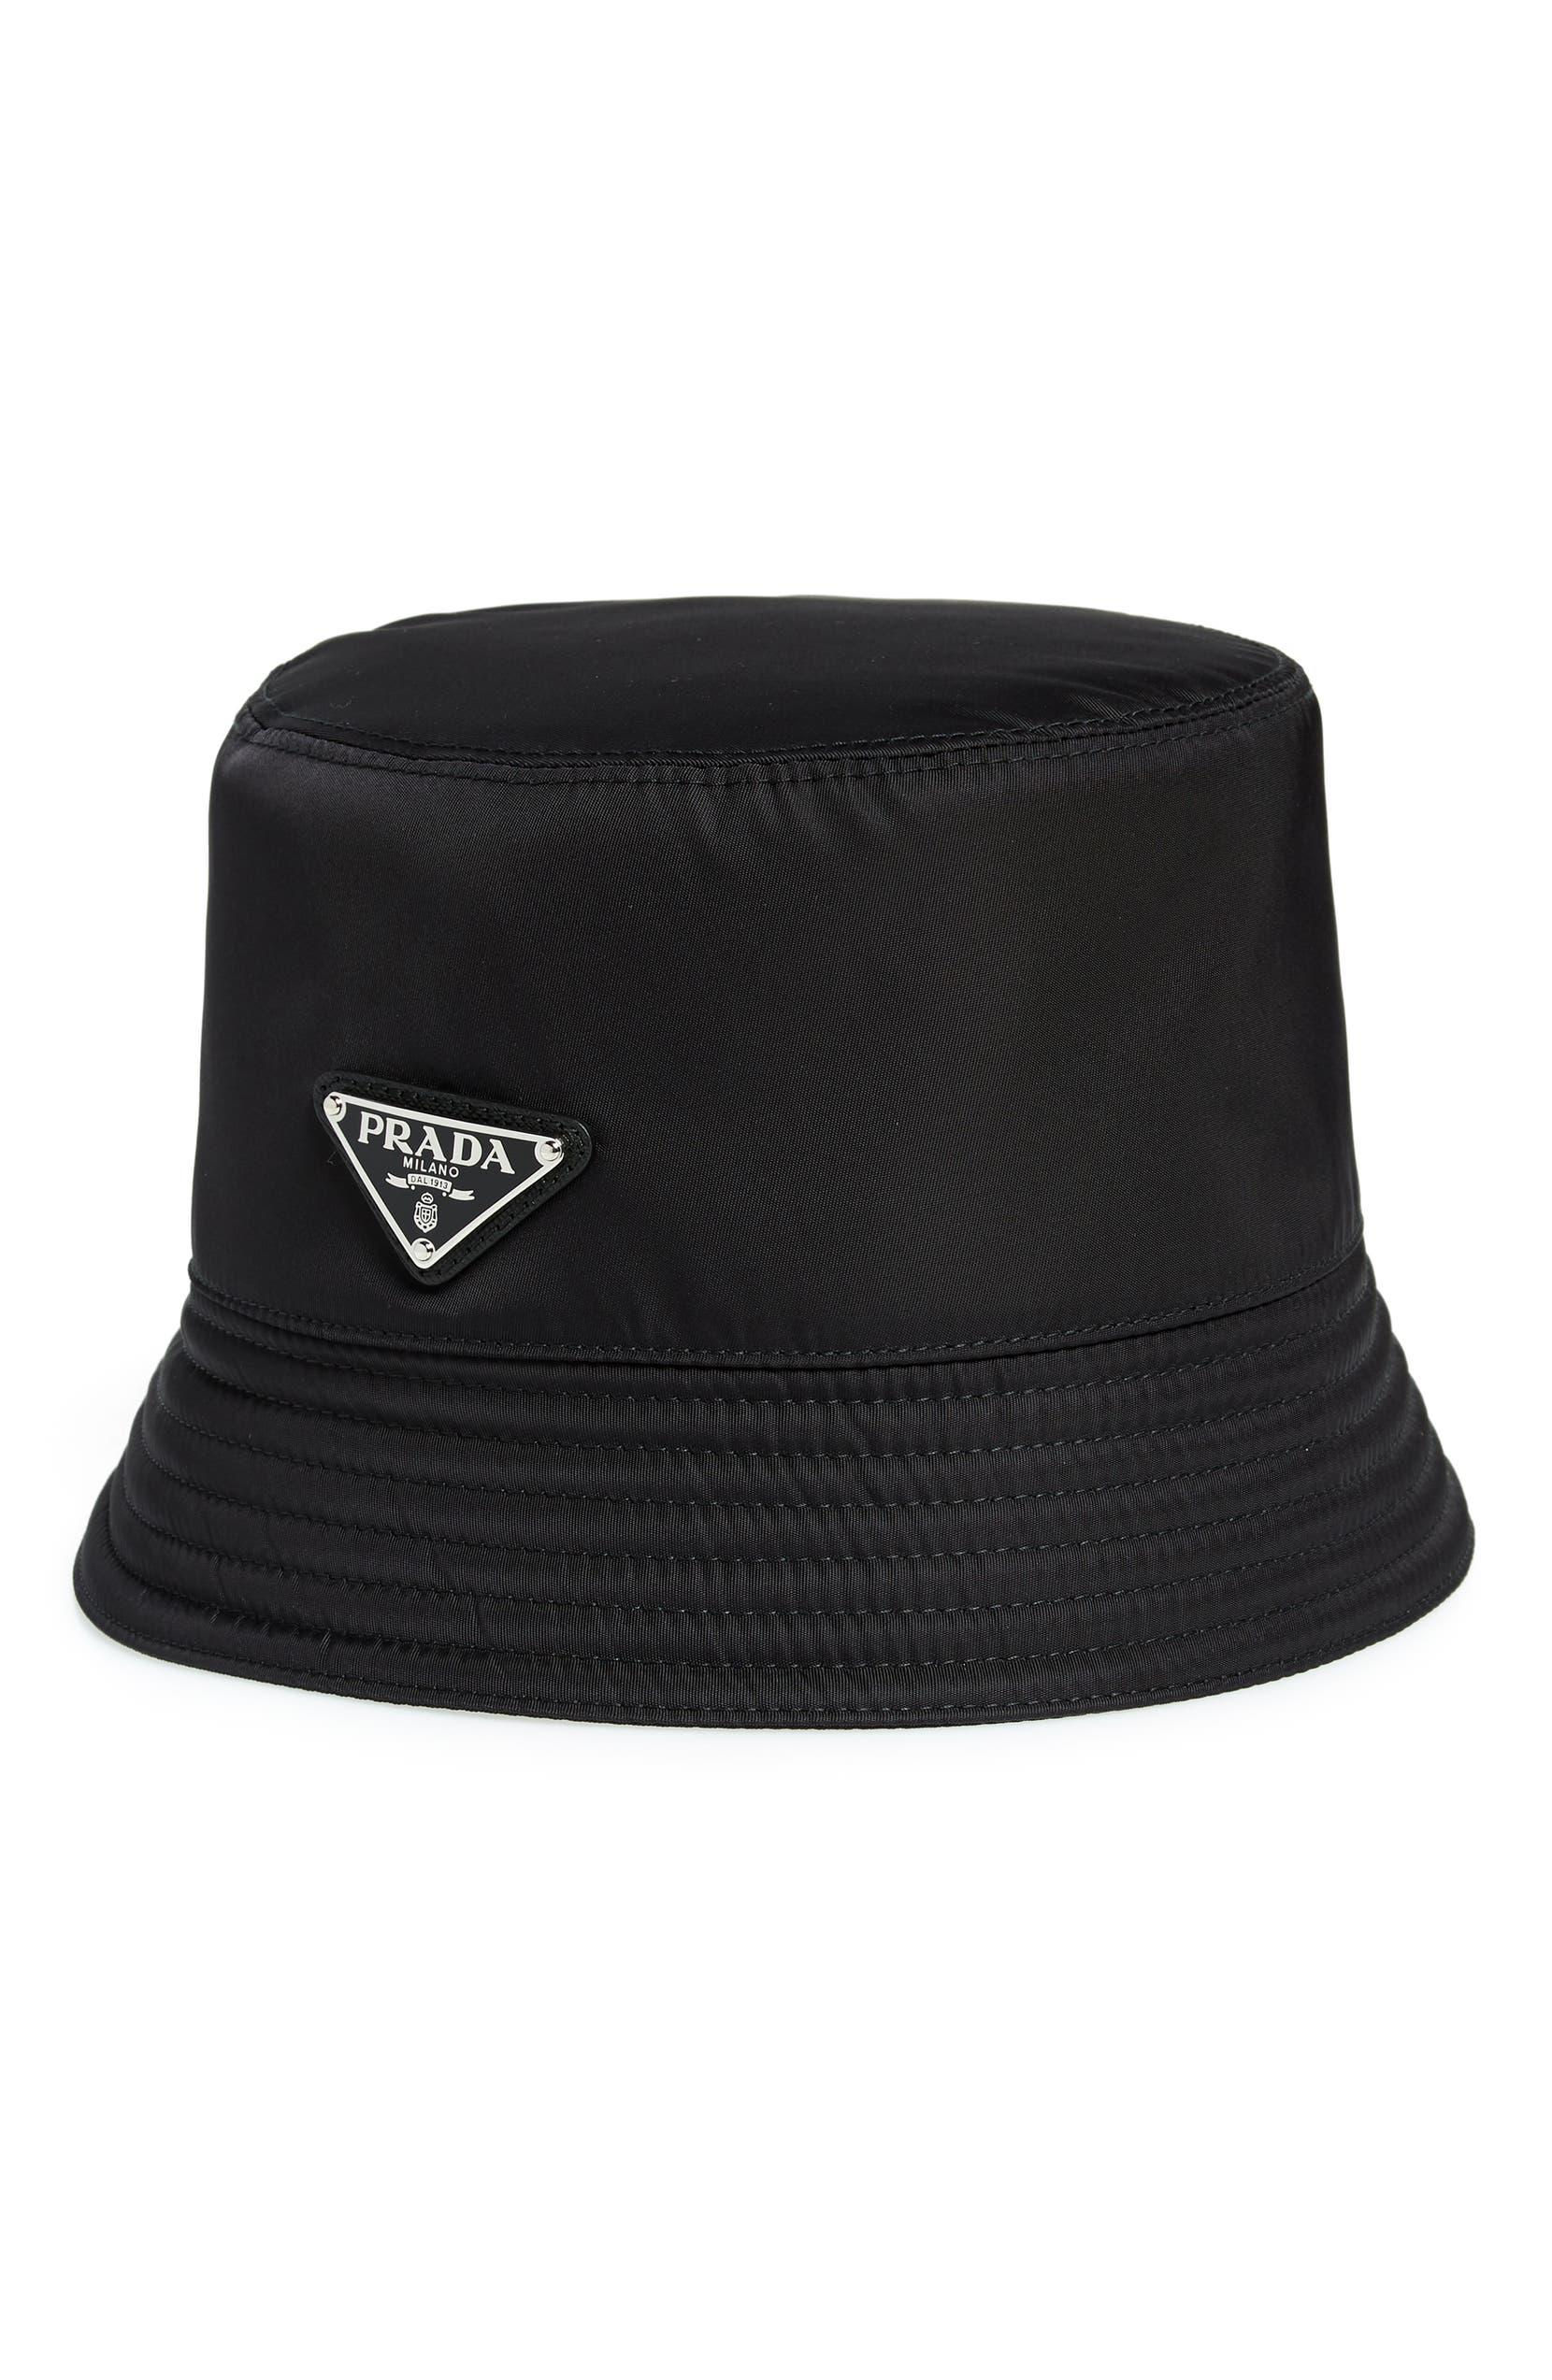 Prada Tessuto Triangolo Nylon Bucket Hat  e0f74e3b249